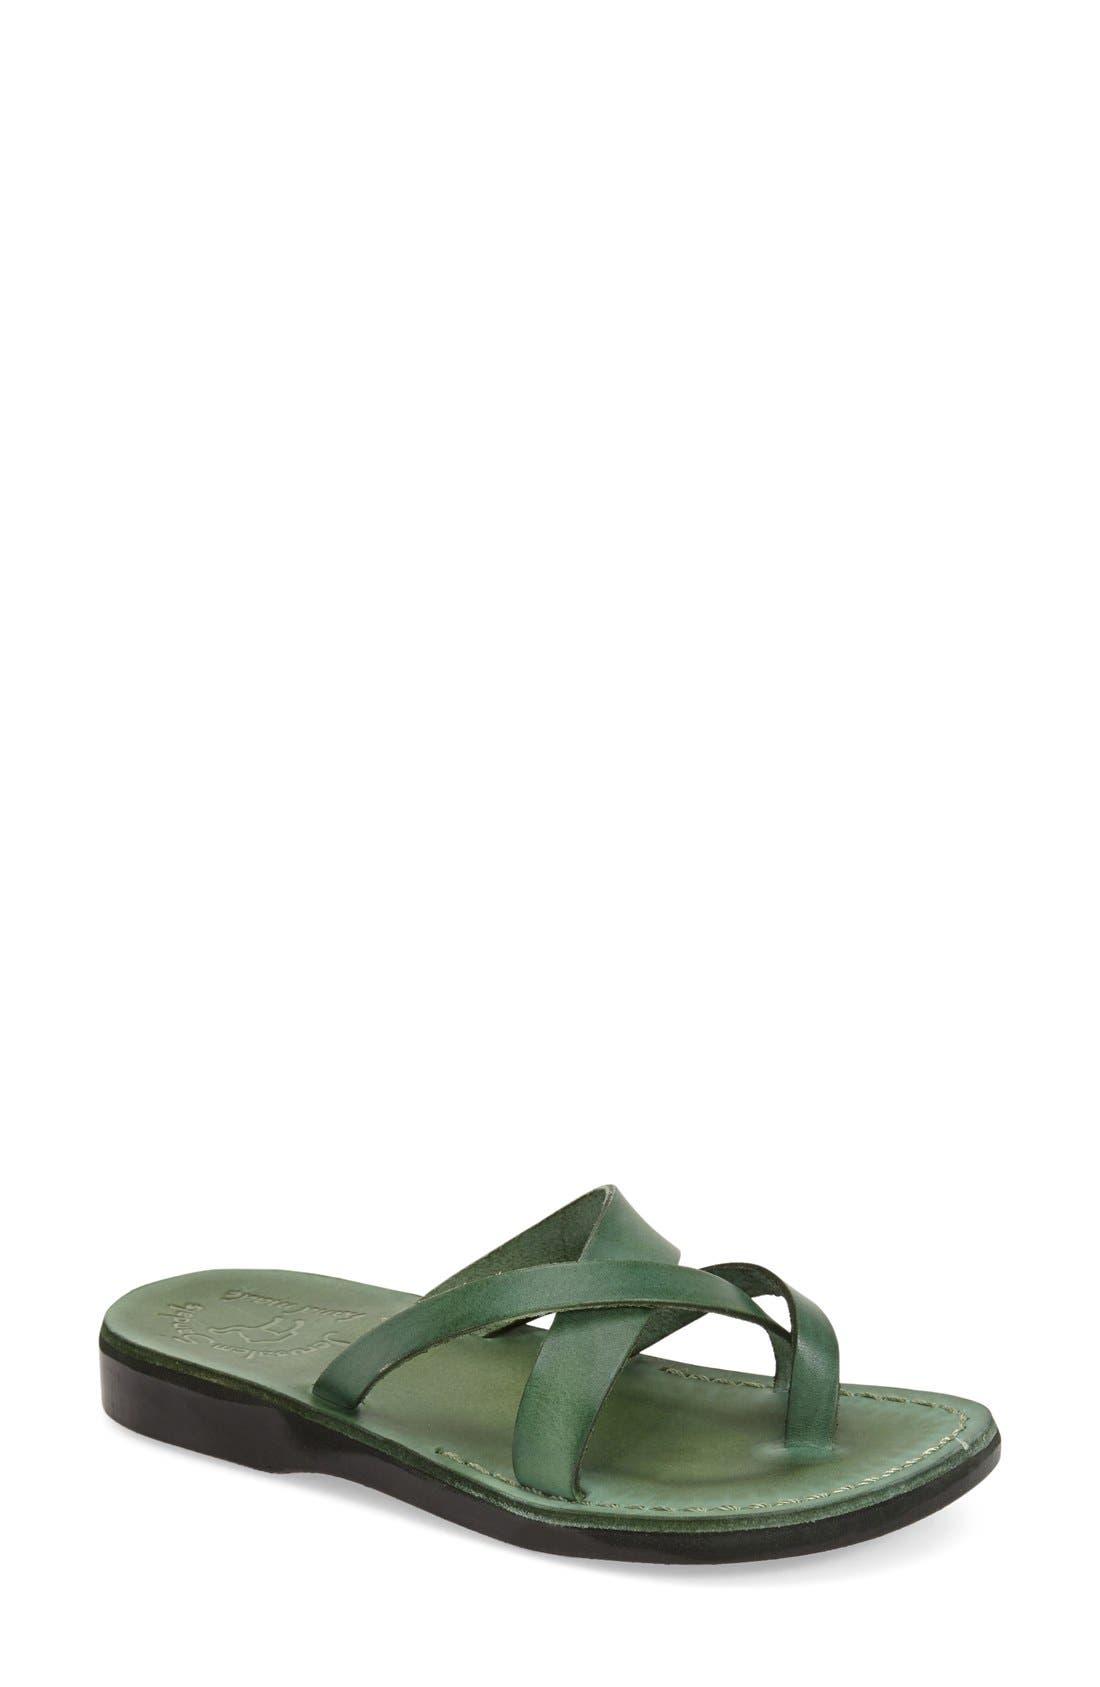 'Abigail' Strappy Slide Sandal,                         Main,                         color,